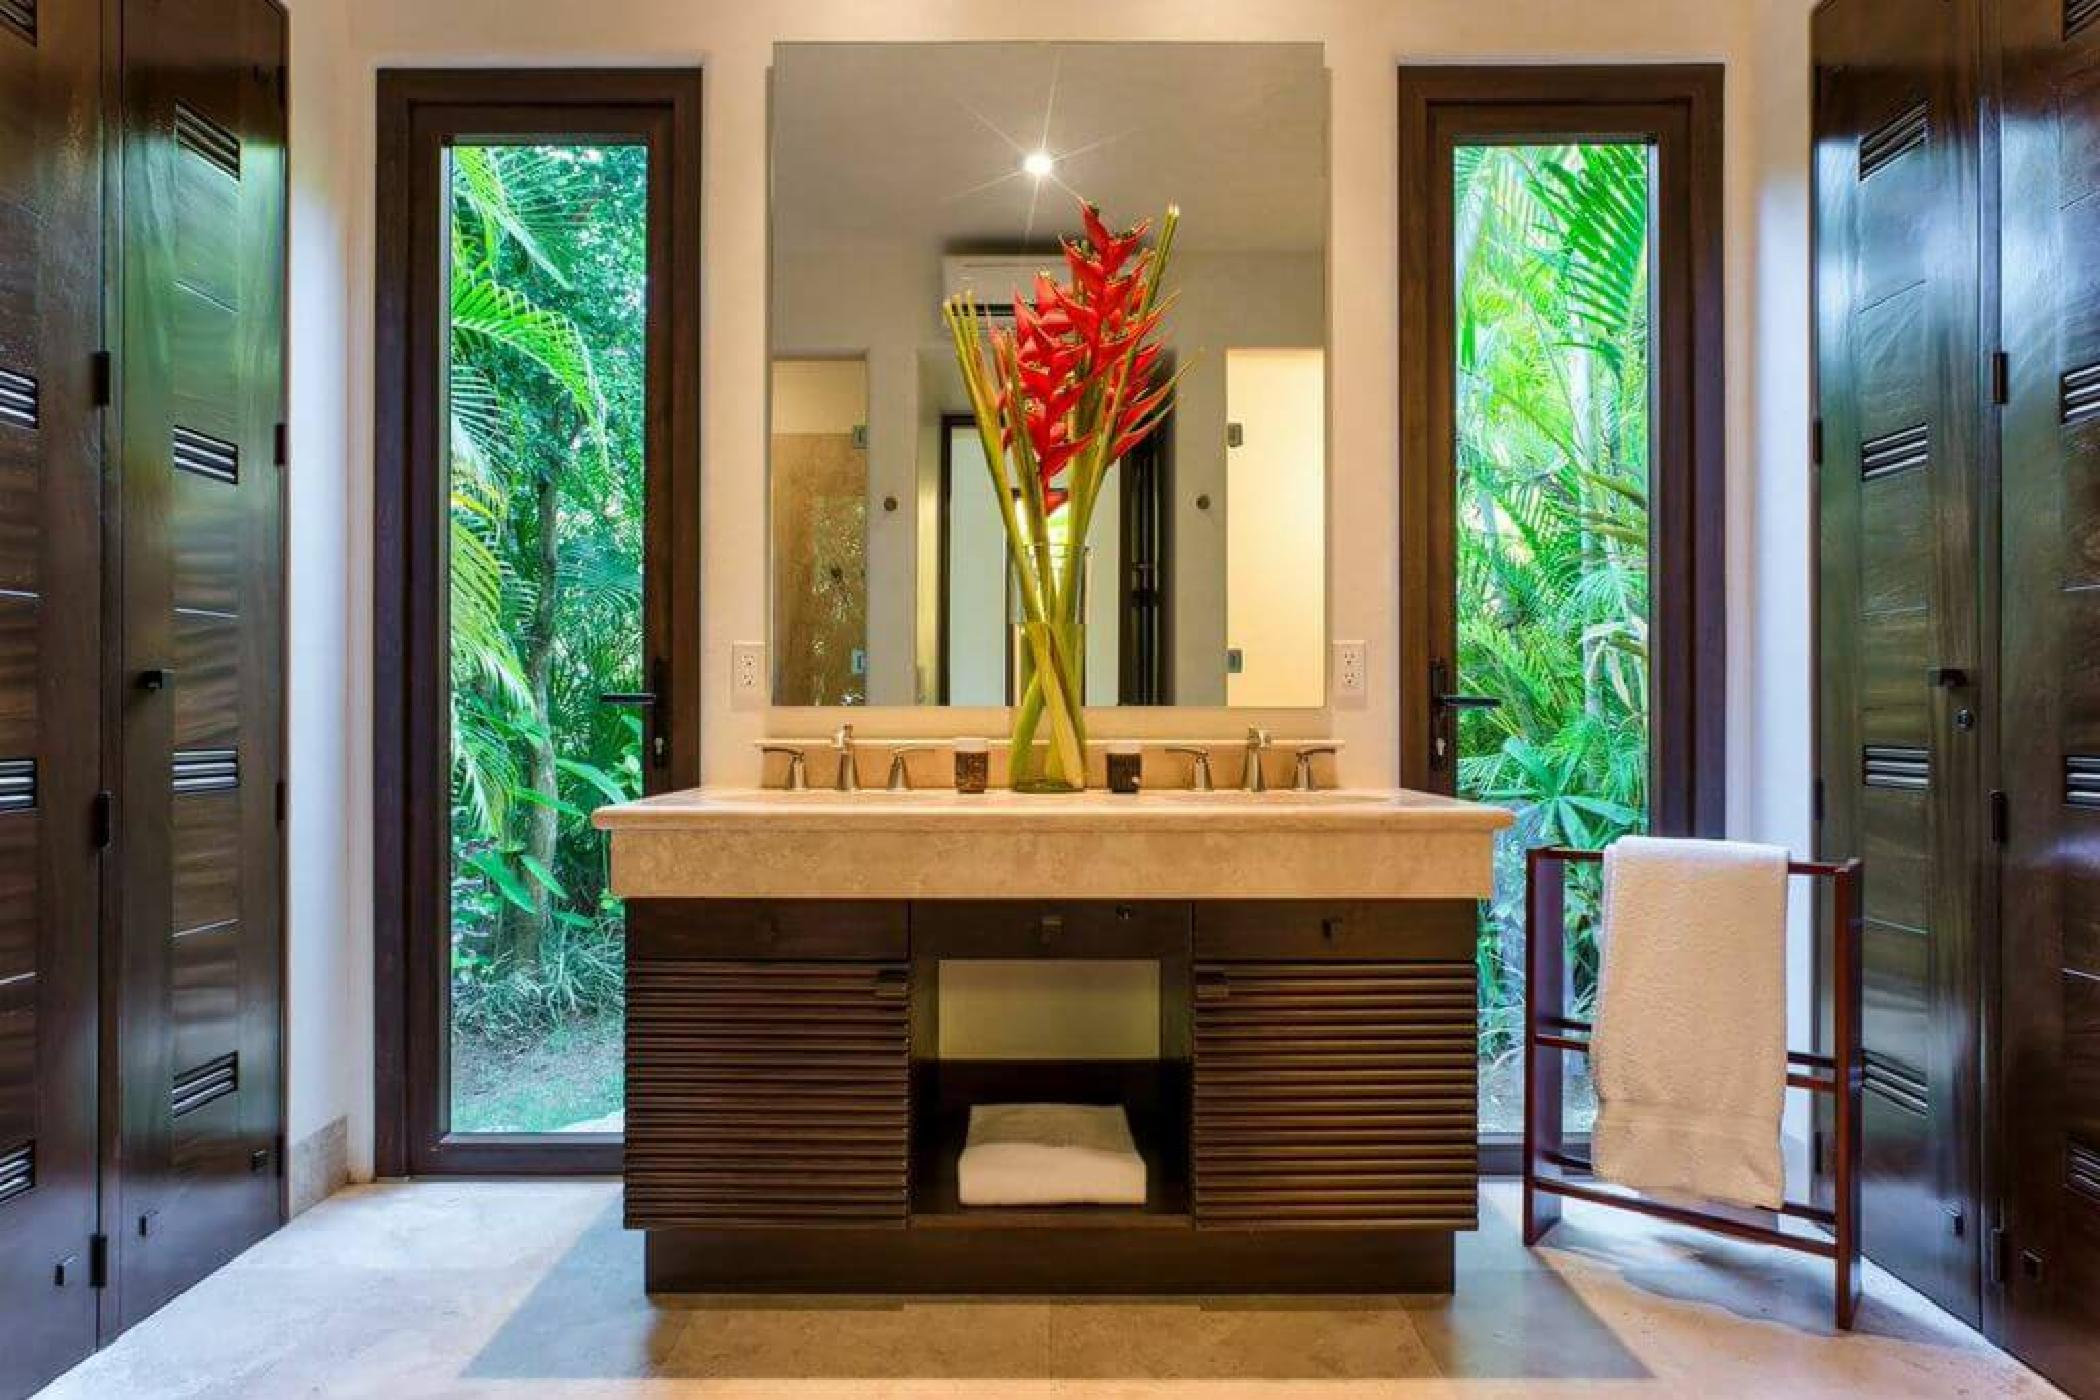 The bunk room bath features outdoor and indoor showers.